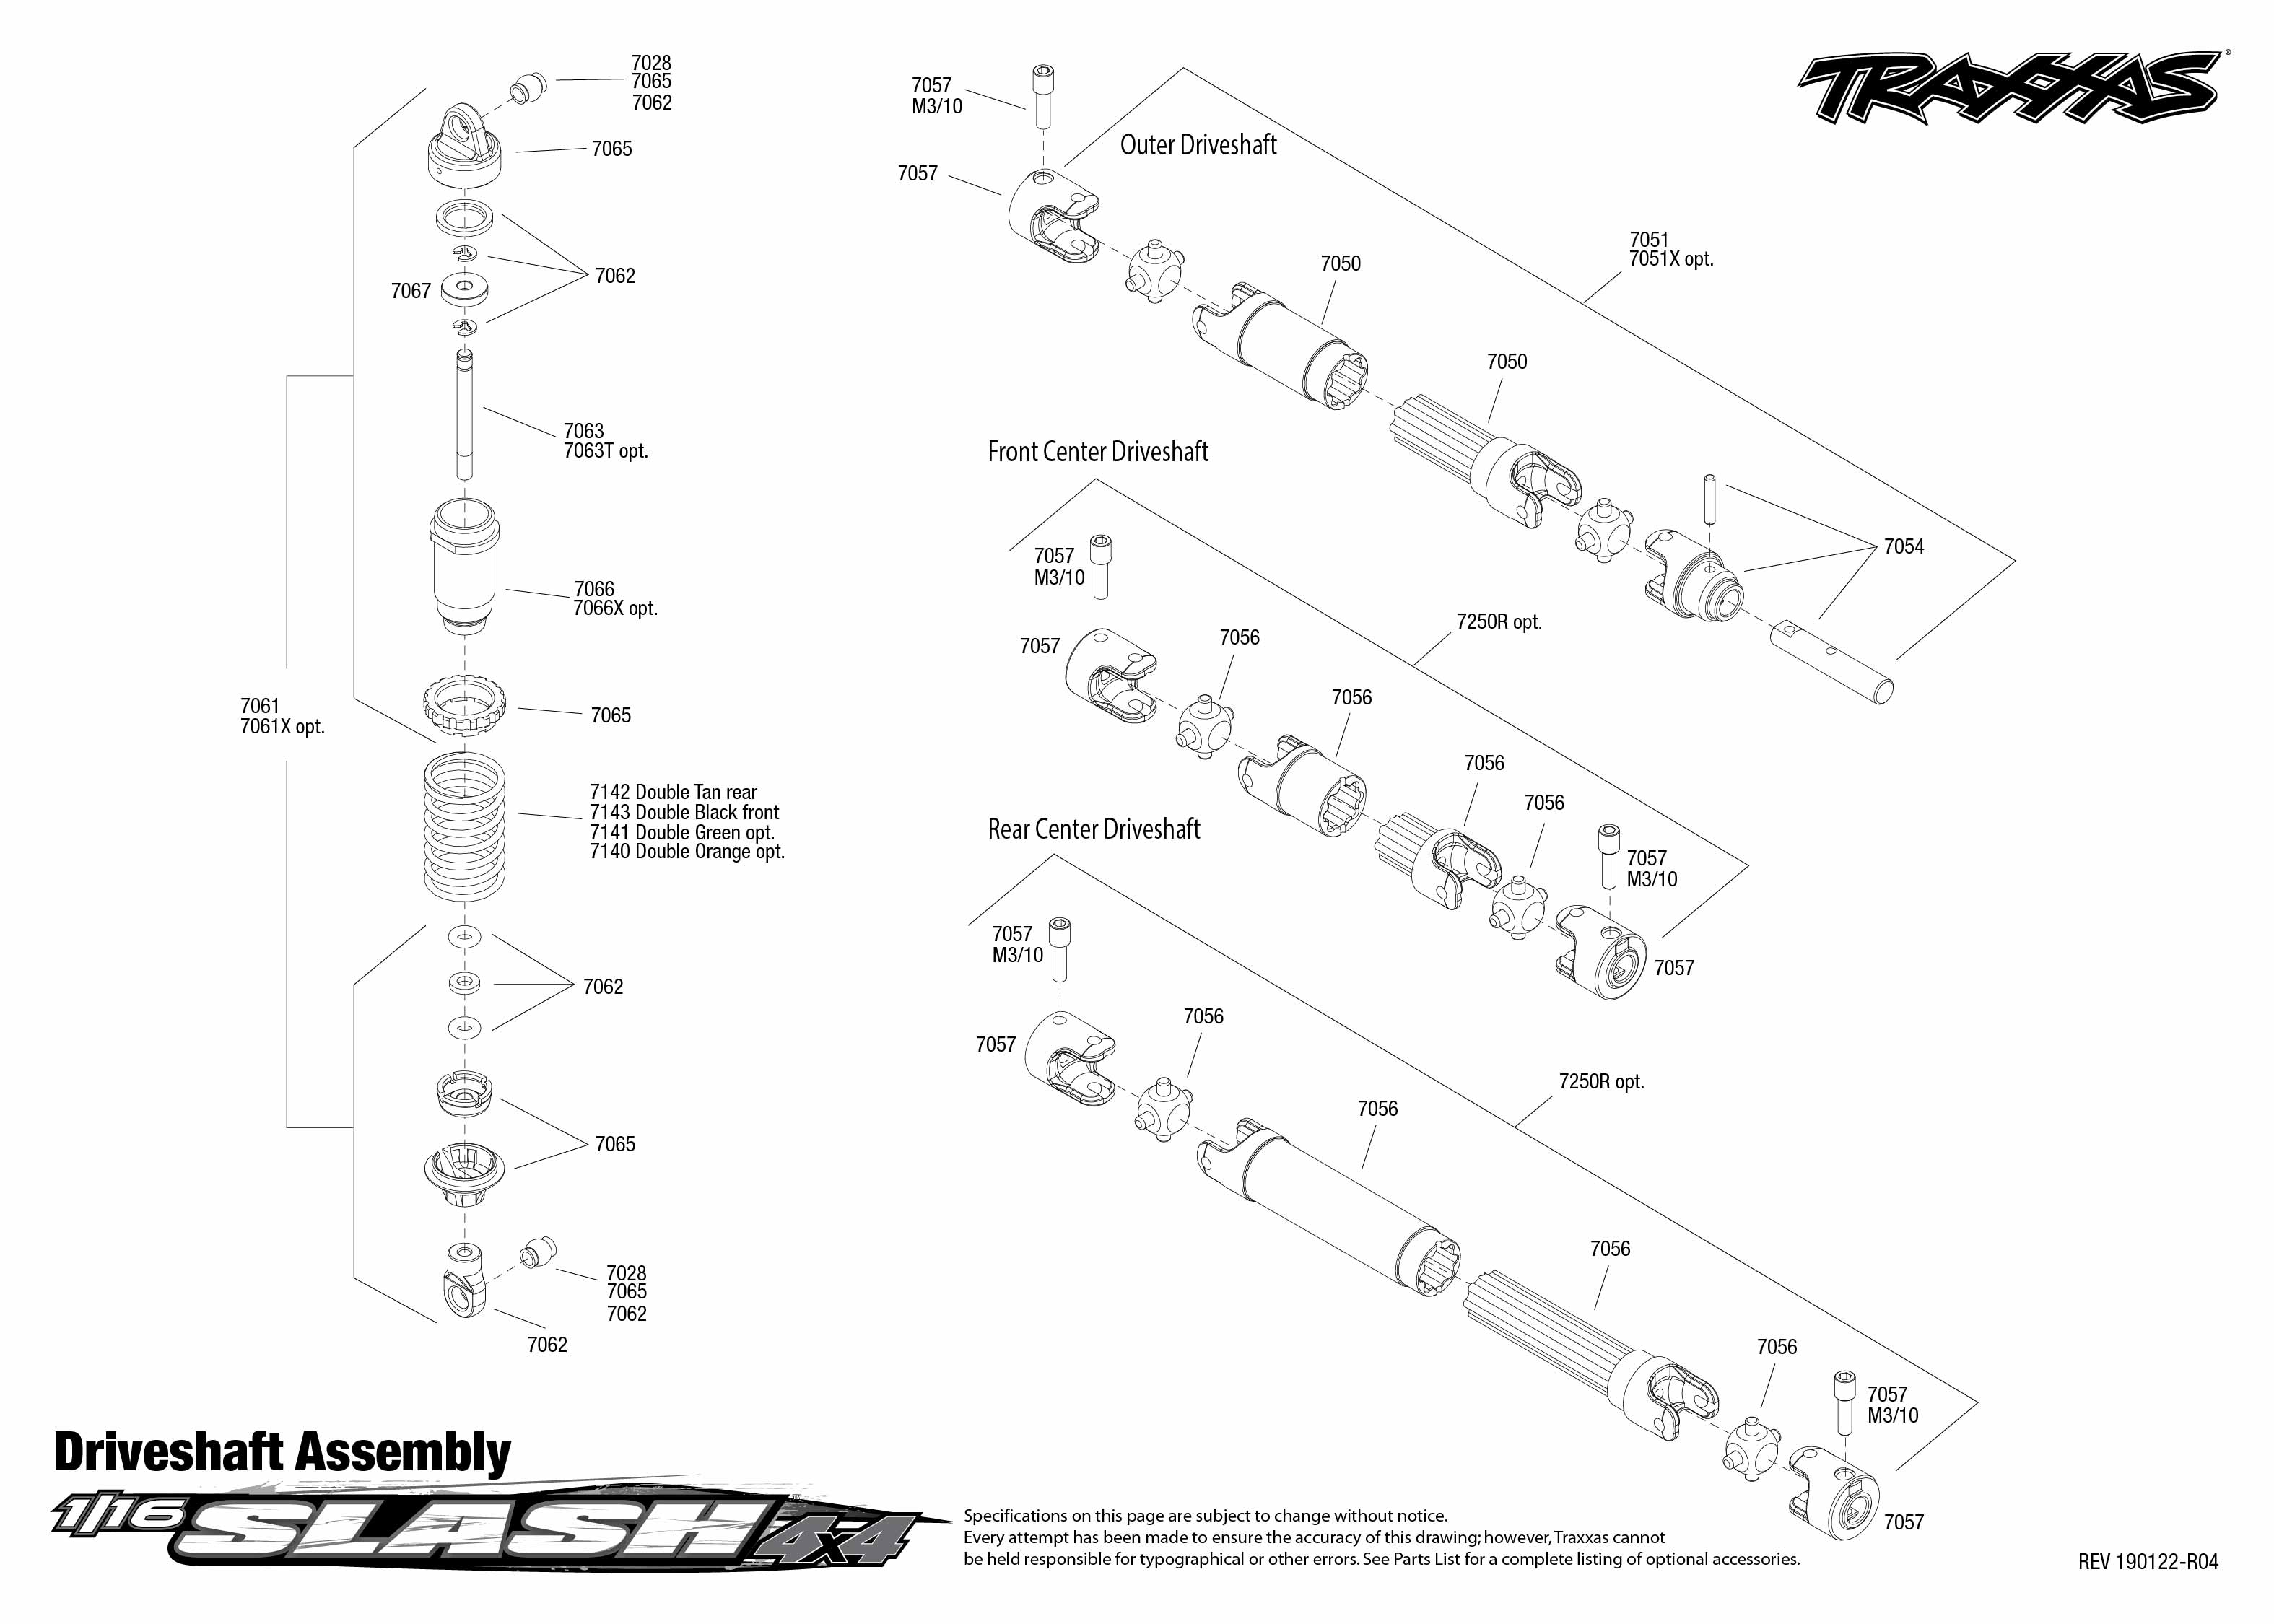 Traxxas Slash Pro 1/16 4WD Short course truck, Mike